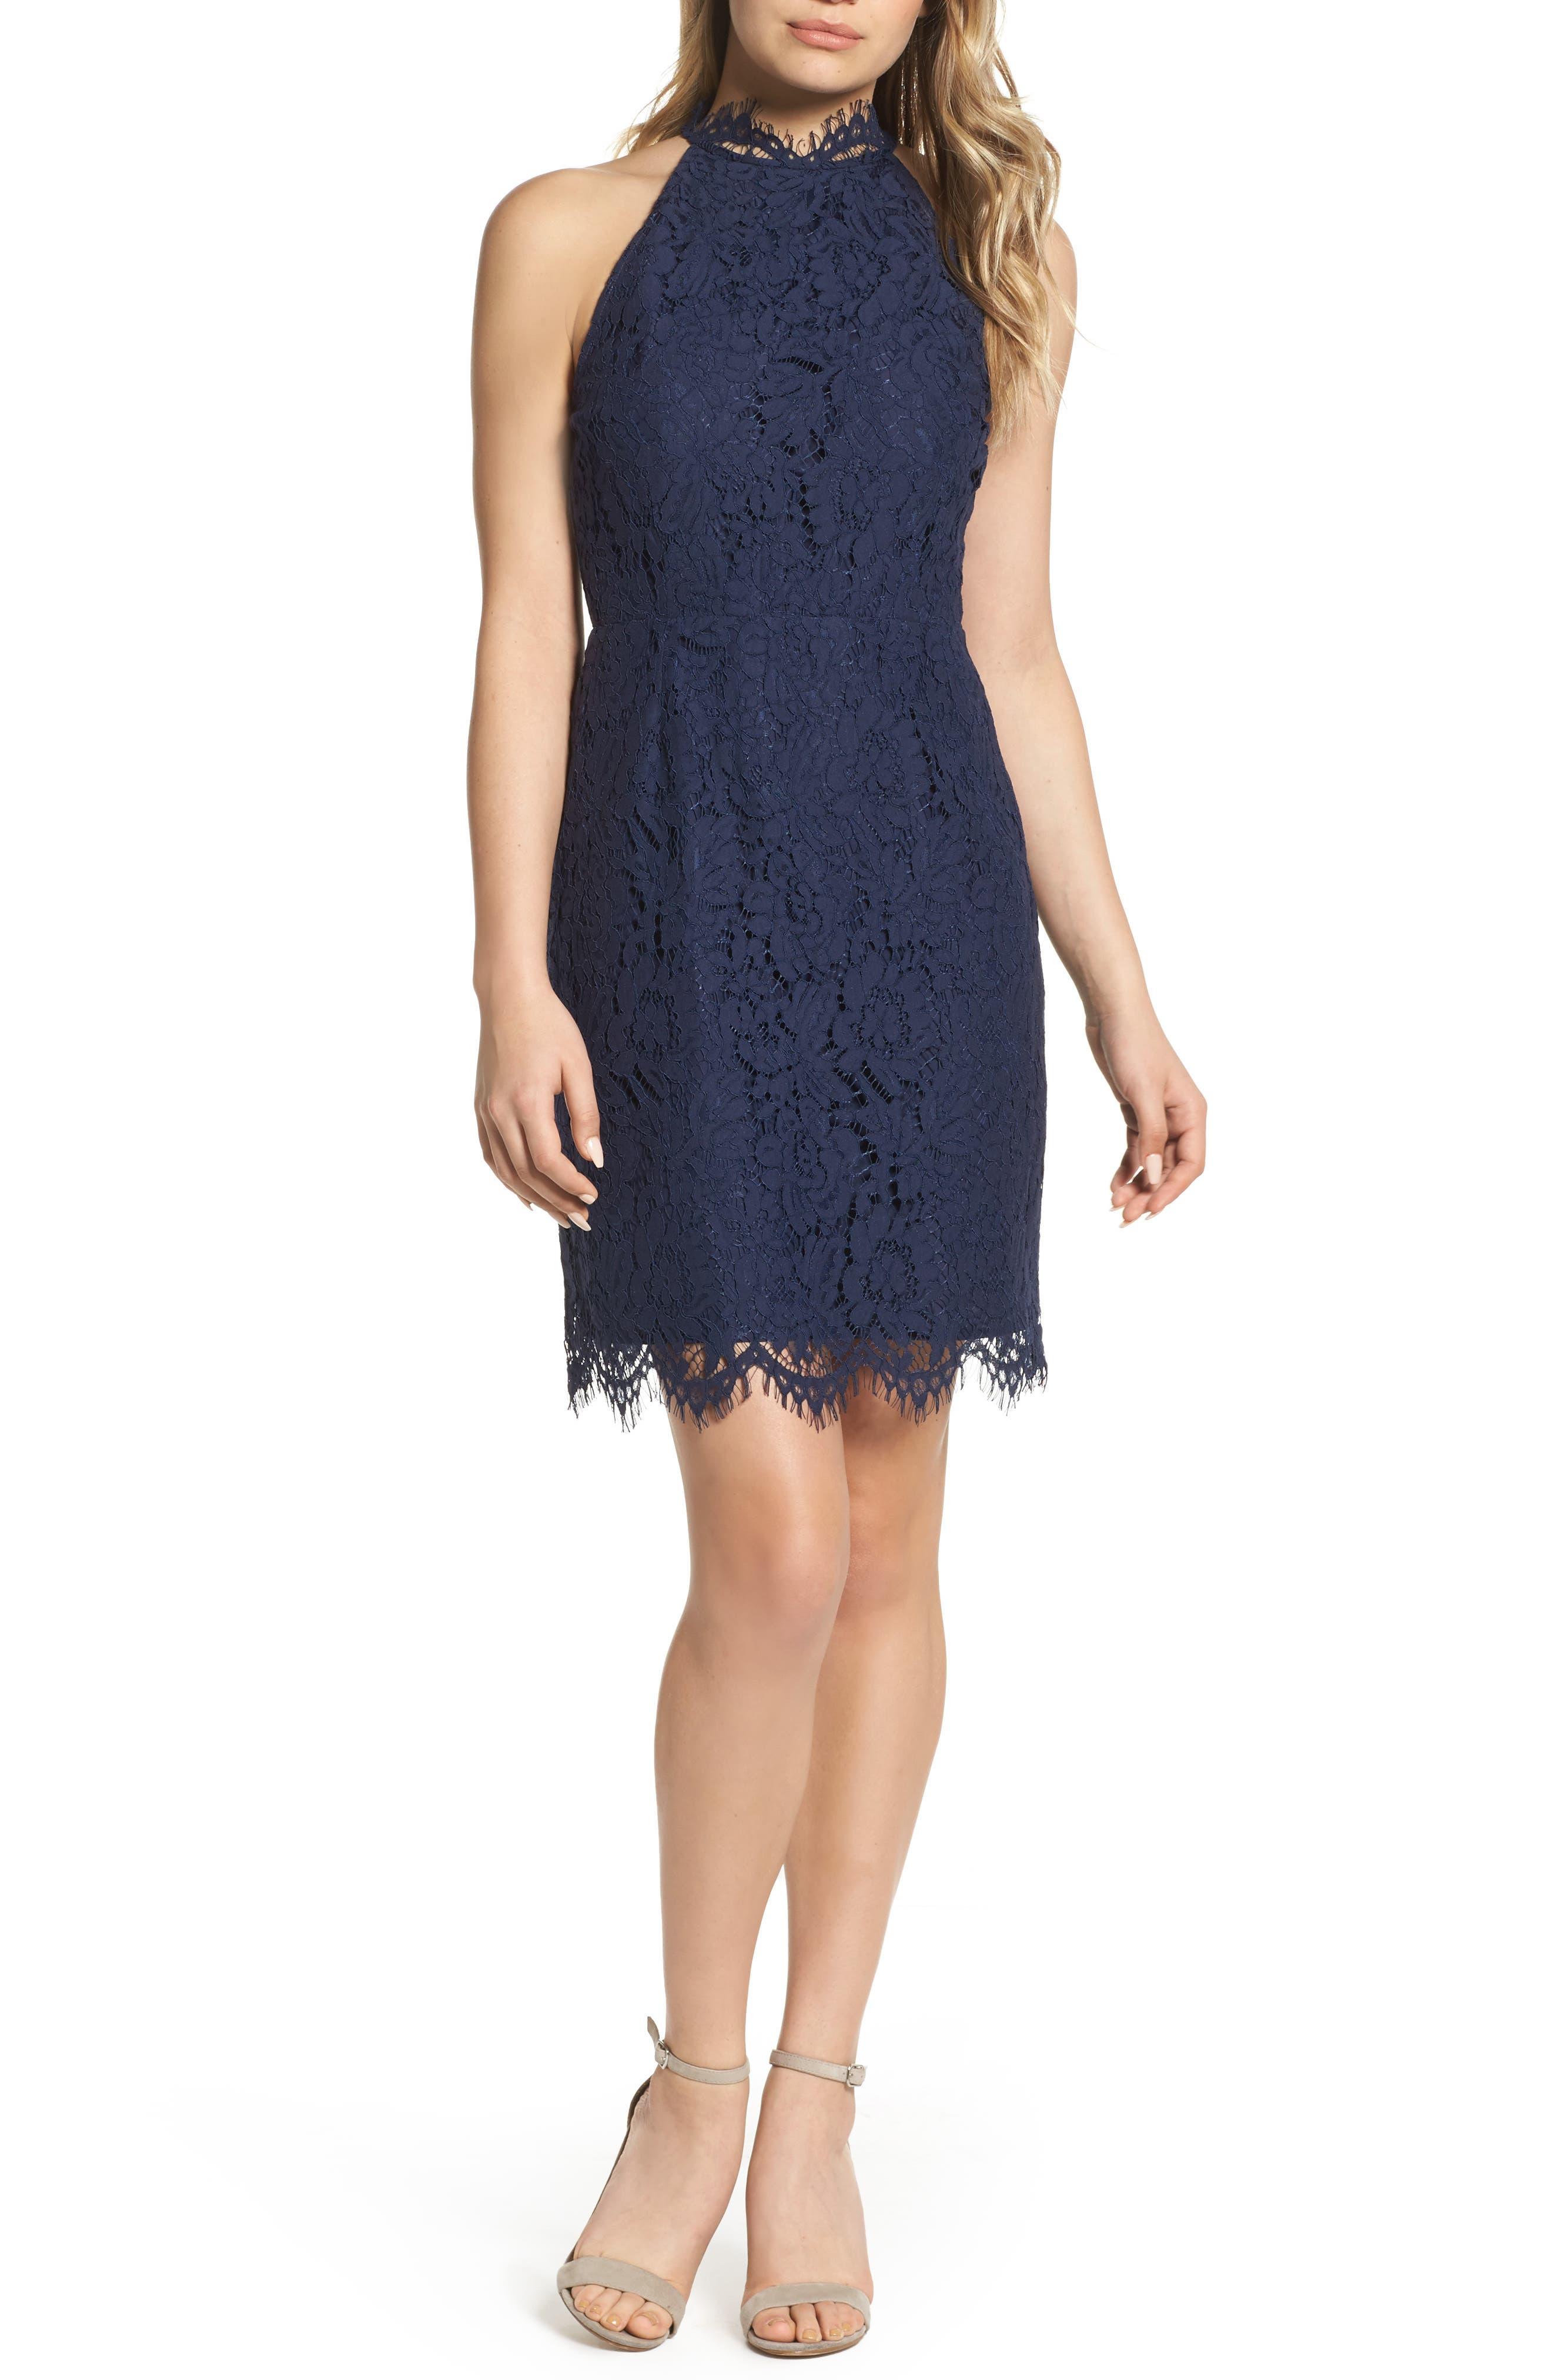 'Cara' High Neck Lace Dress,                             Main thumbnail 1, color,                             NAVY